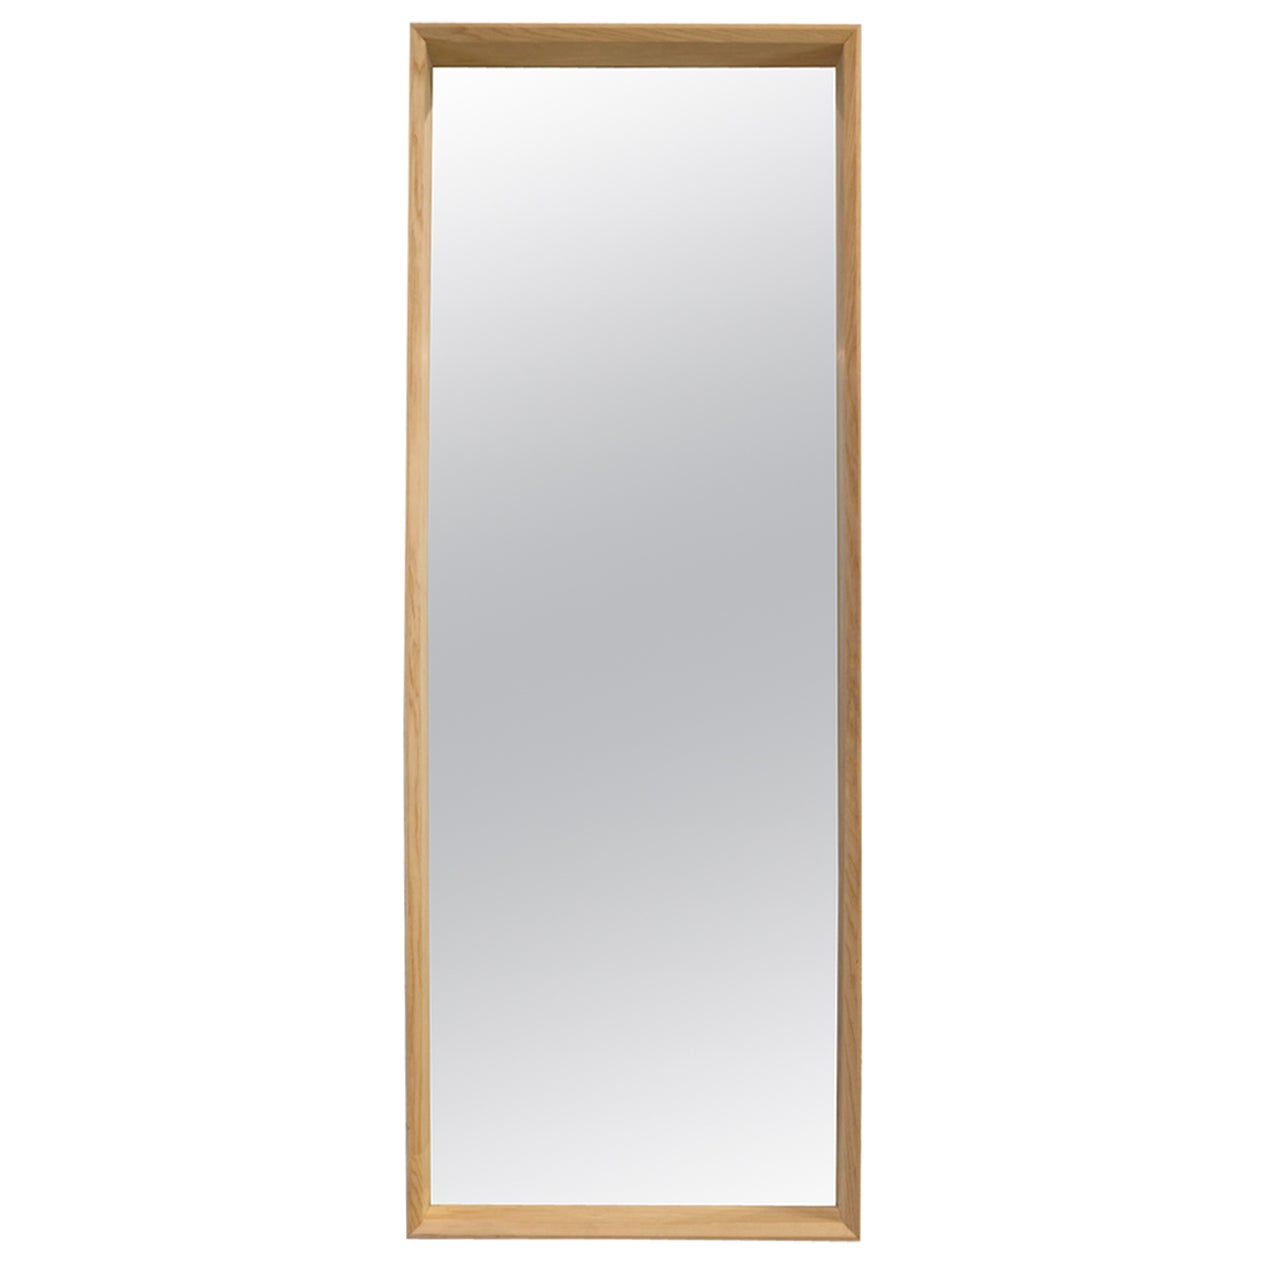 Floor Standing Handmade Large Format Hardwood Ash Mirror